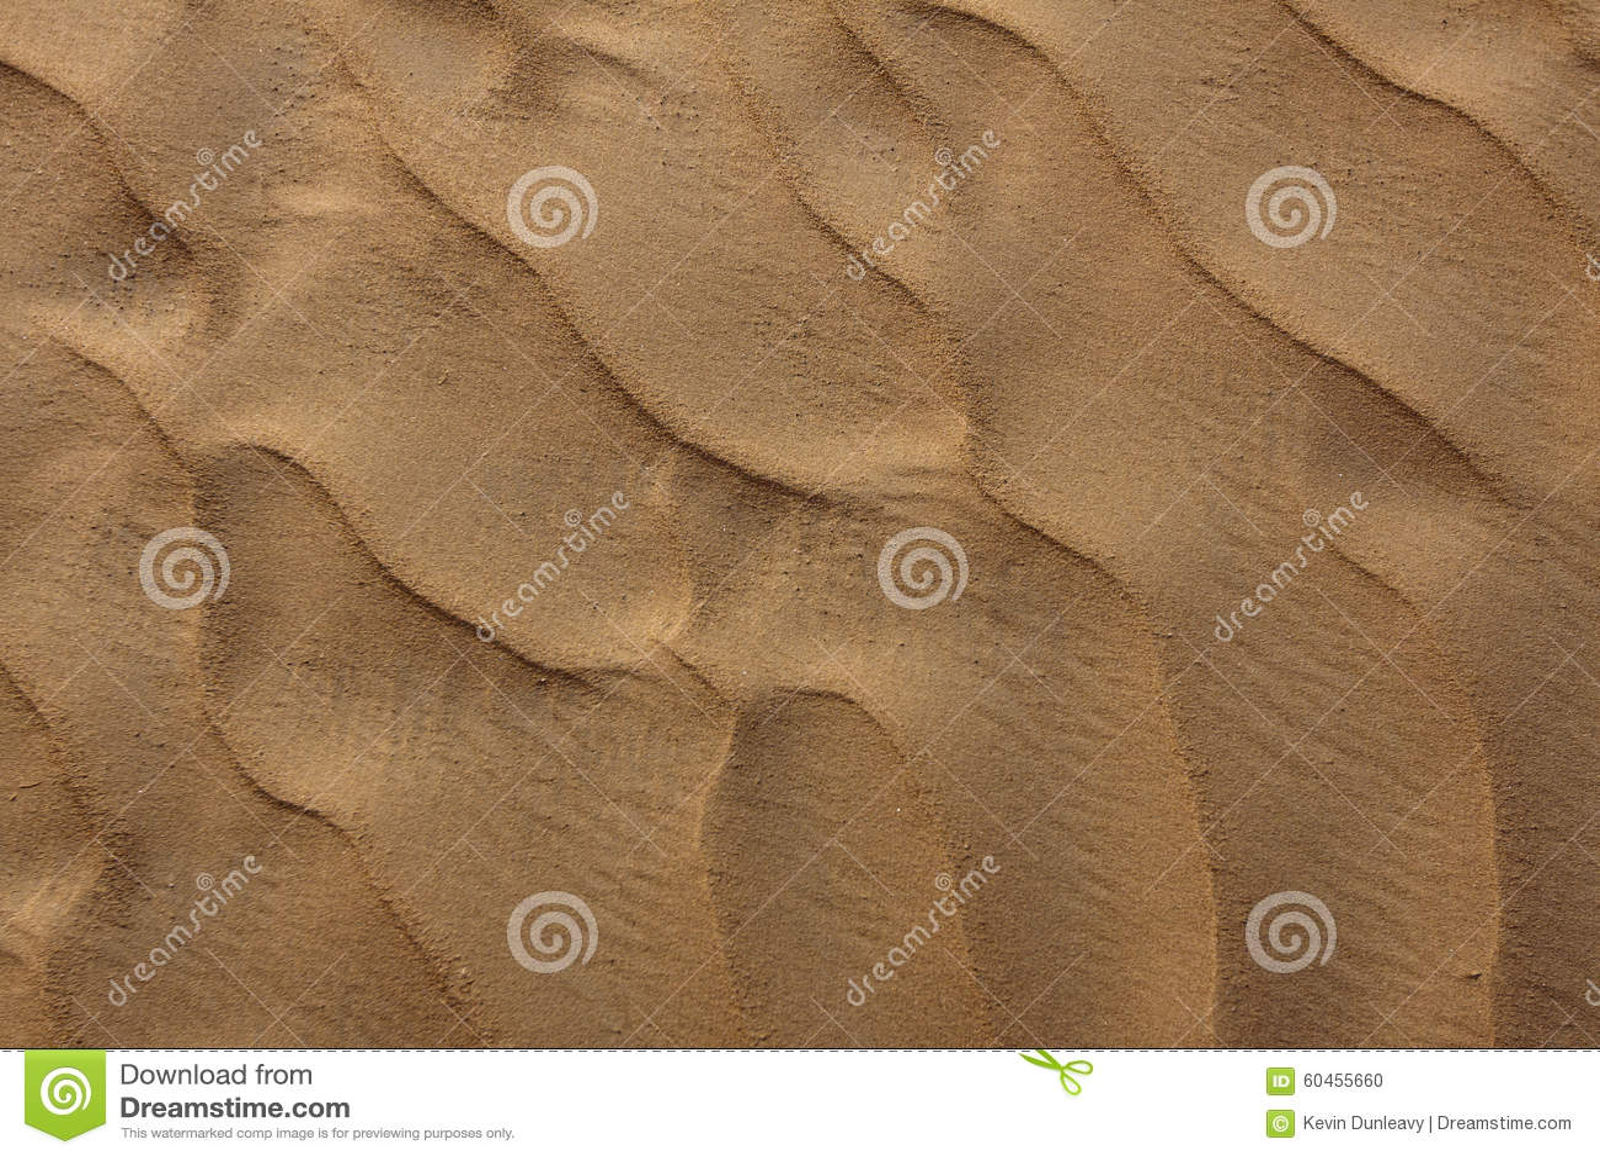 Sanddüne-Kräuselung in der Wüste